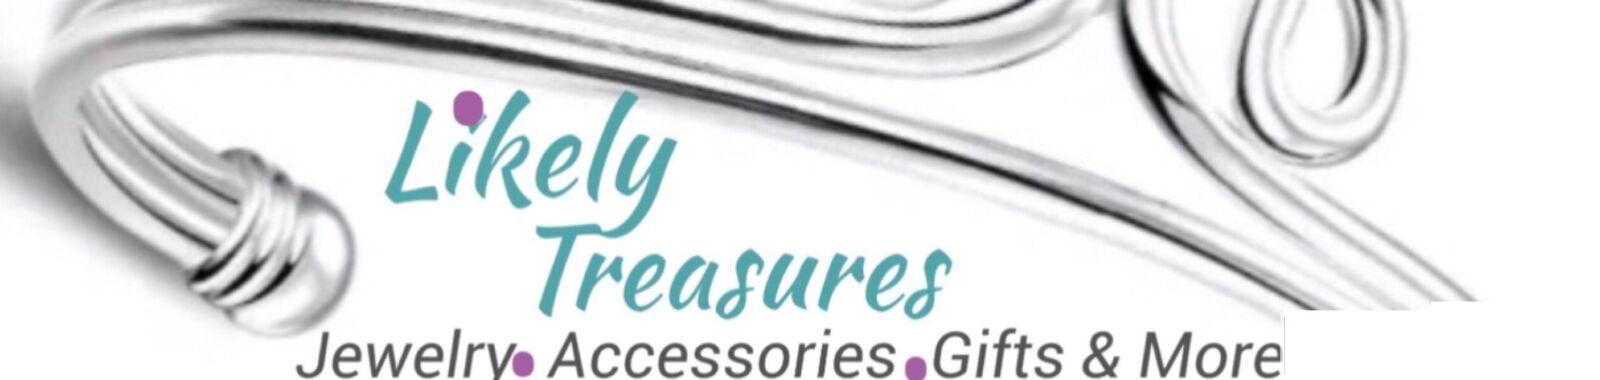 Likely Treasures